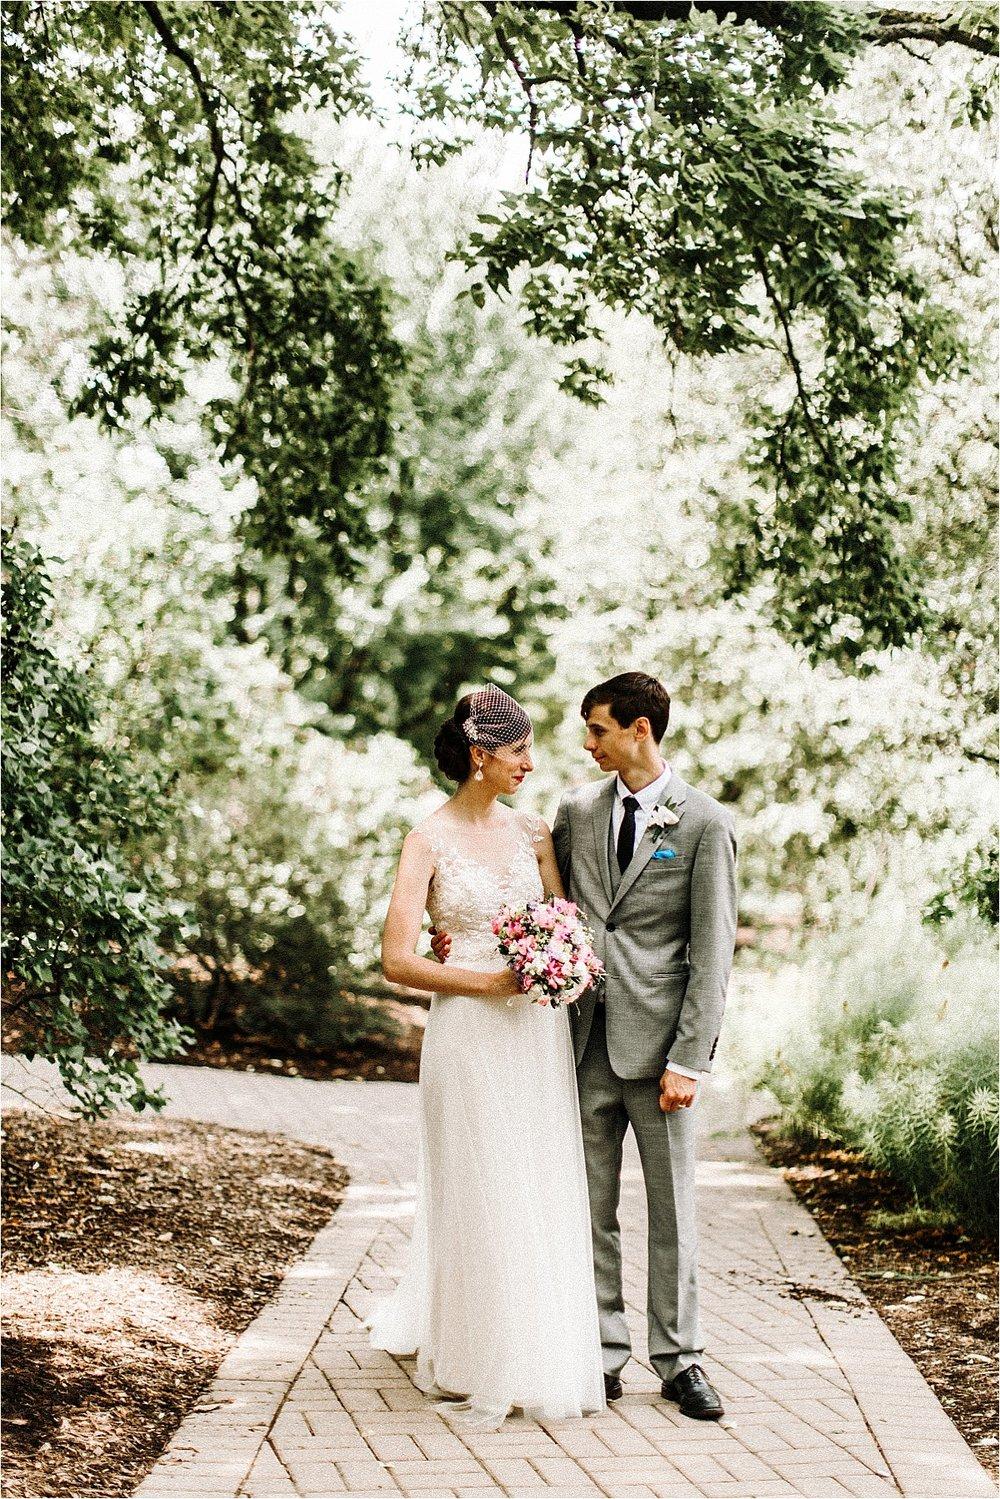 Lilacia Park Wedding_0032.jpg